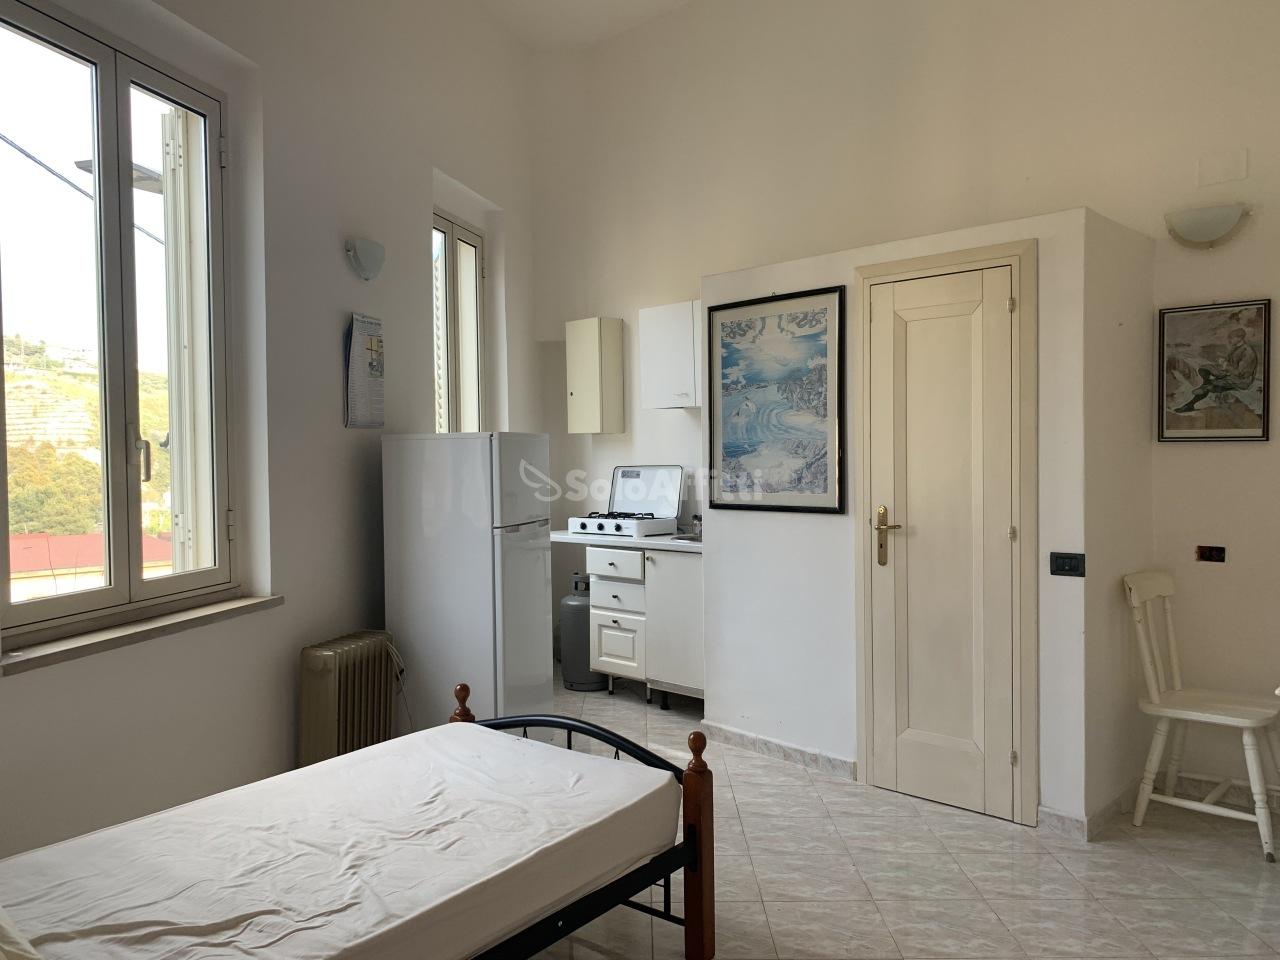 Appartamento in affitto a Catanzaro Sala, Catanzaro (CZ)